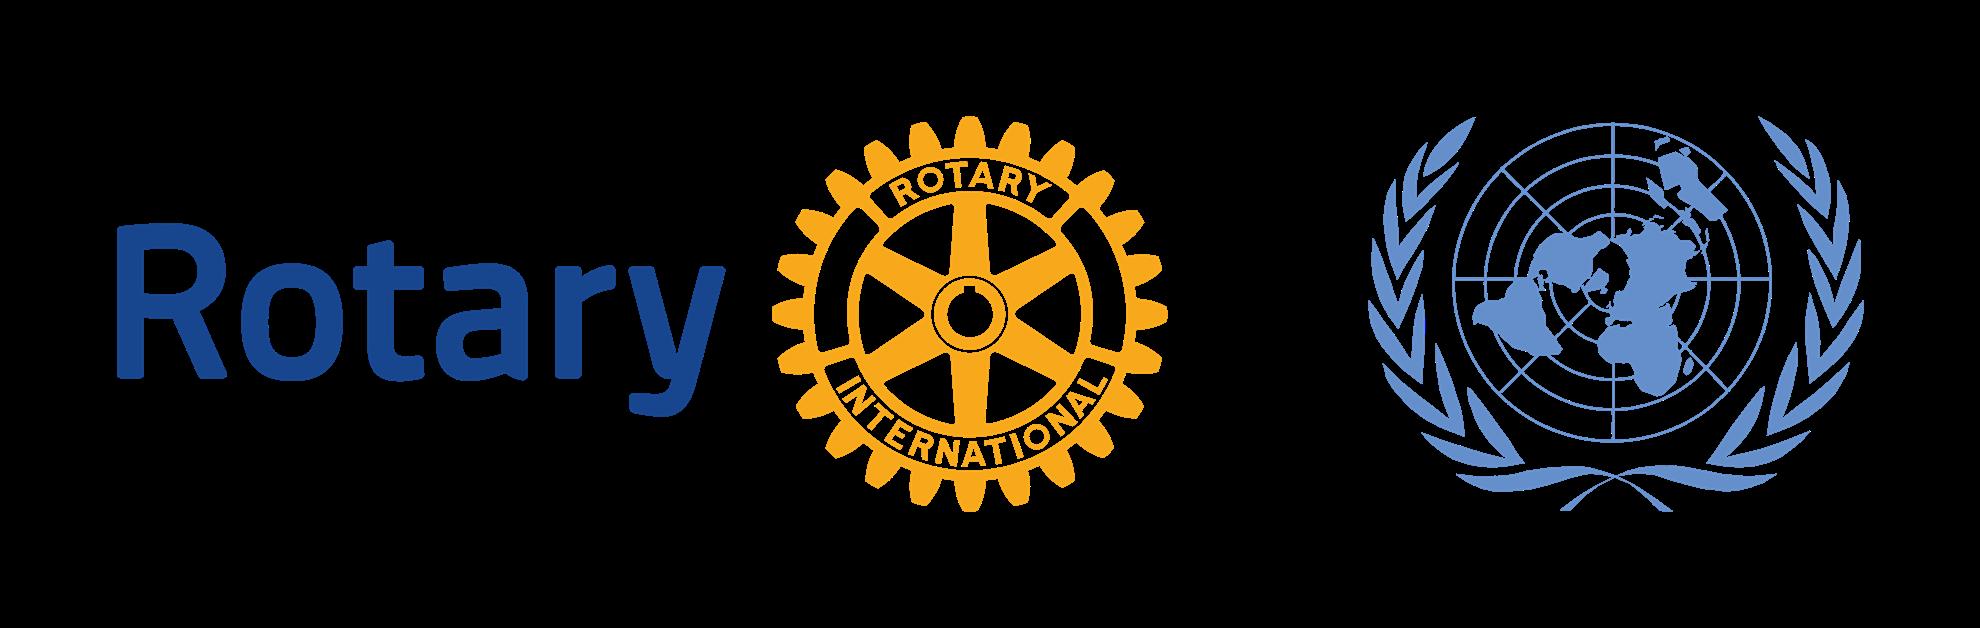 Rotary International Logos